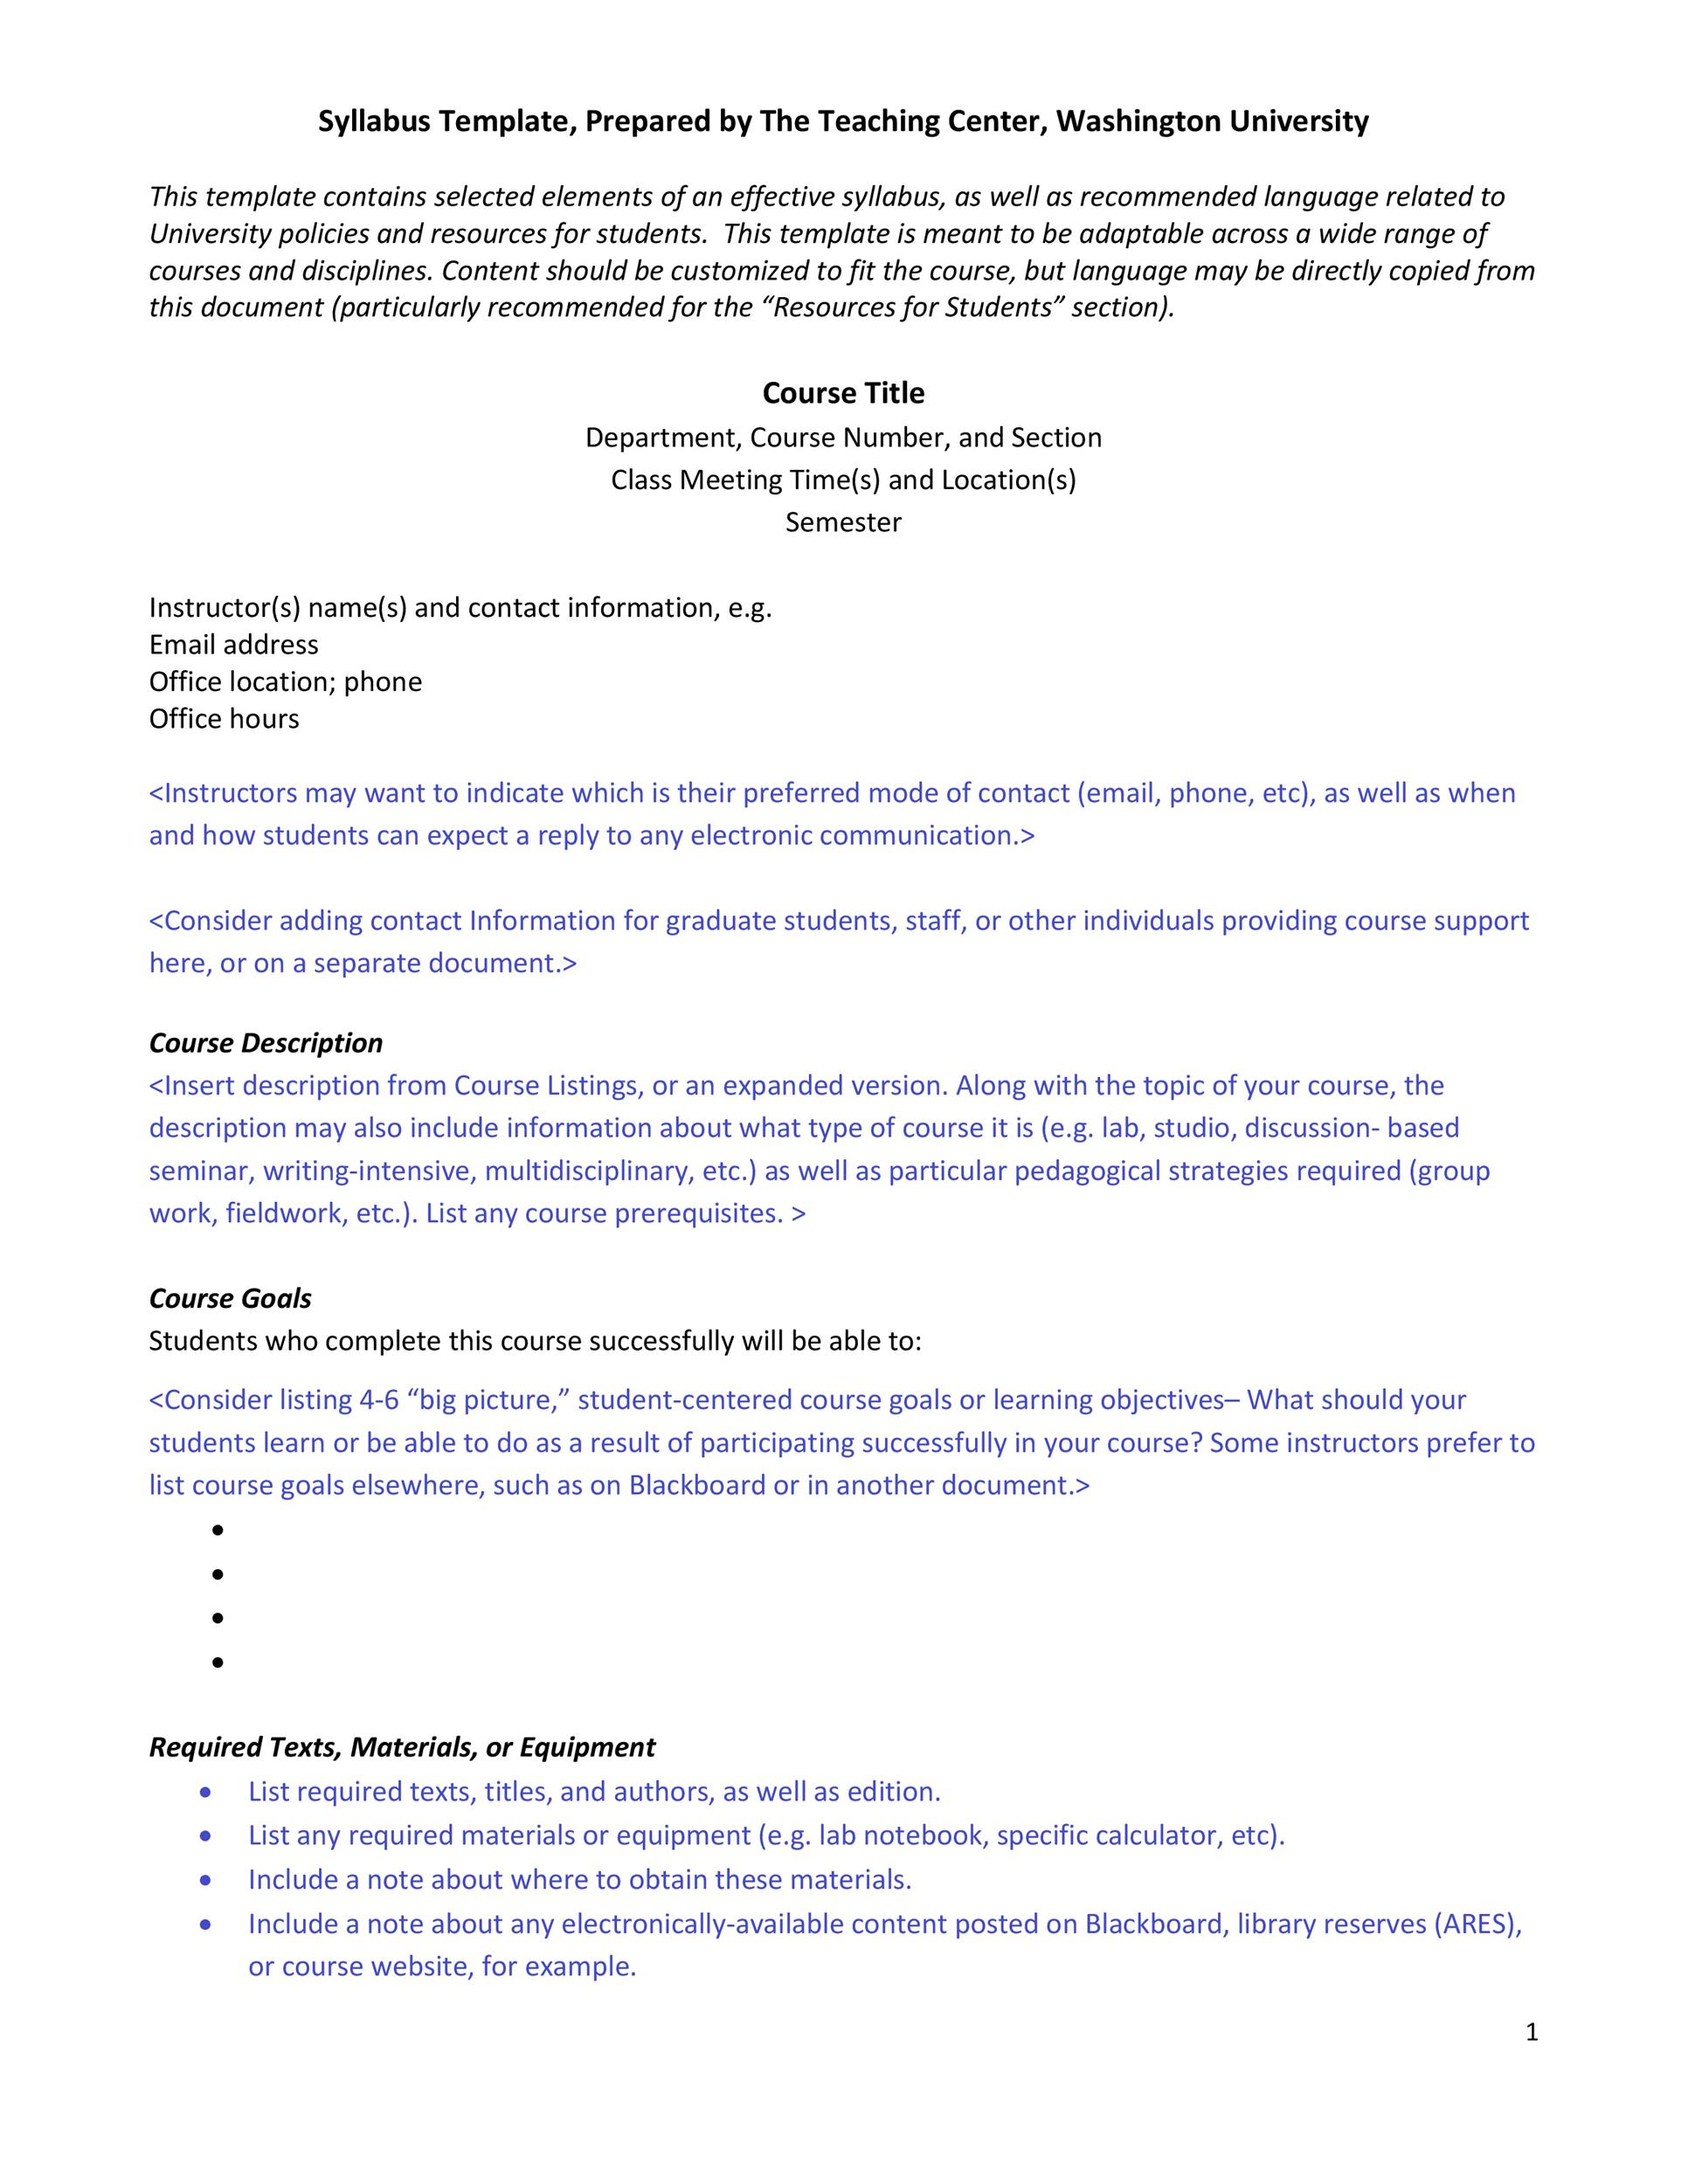 Free sylabus template 01